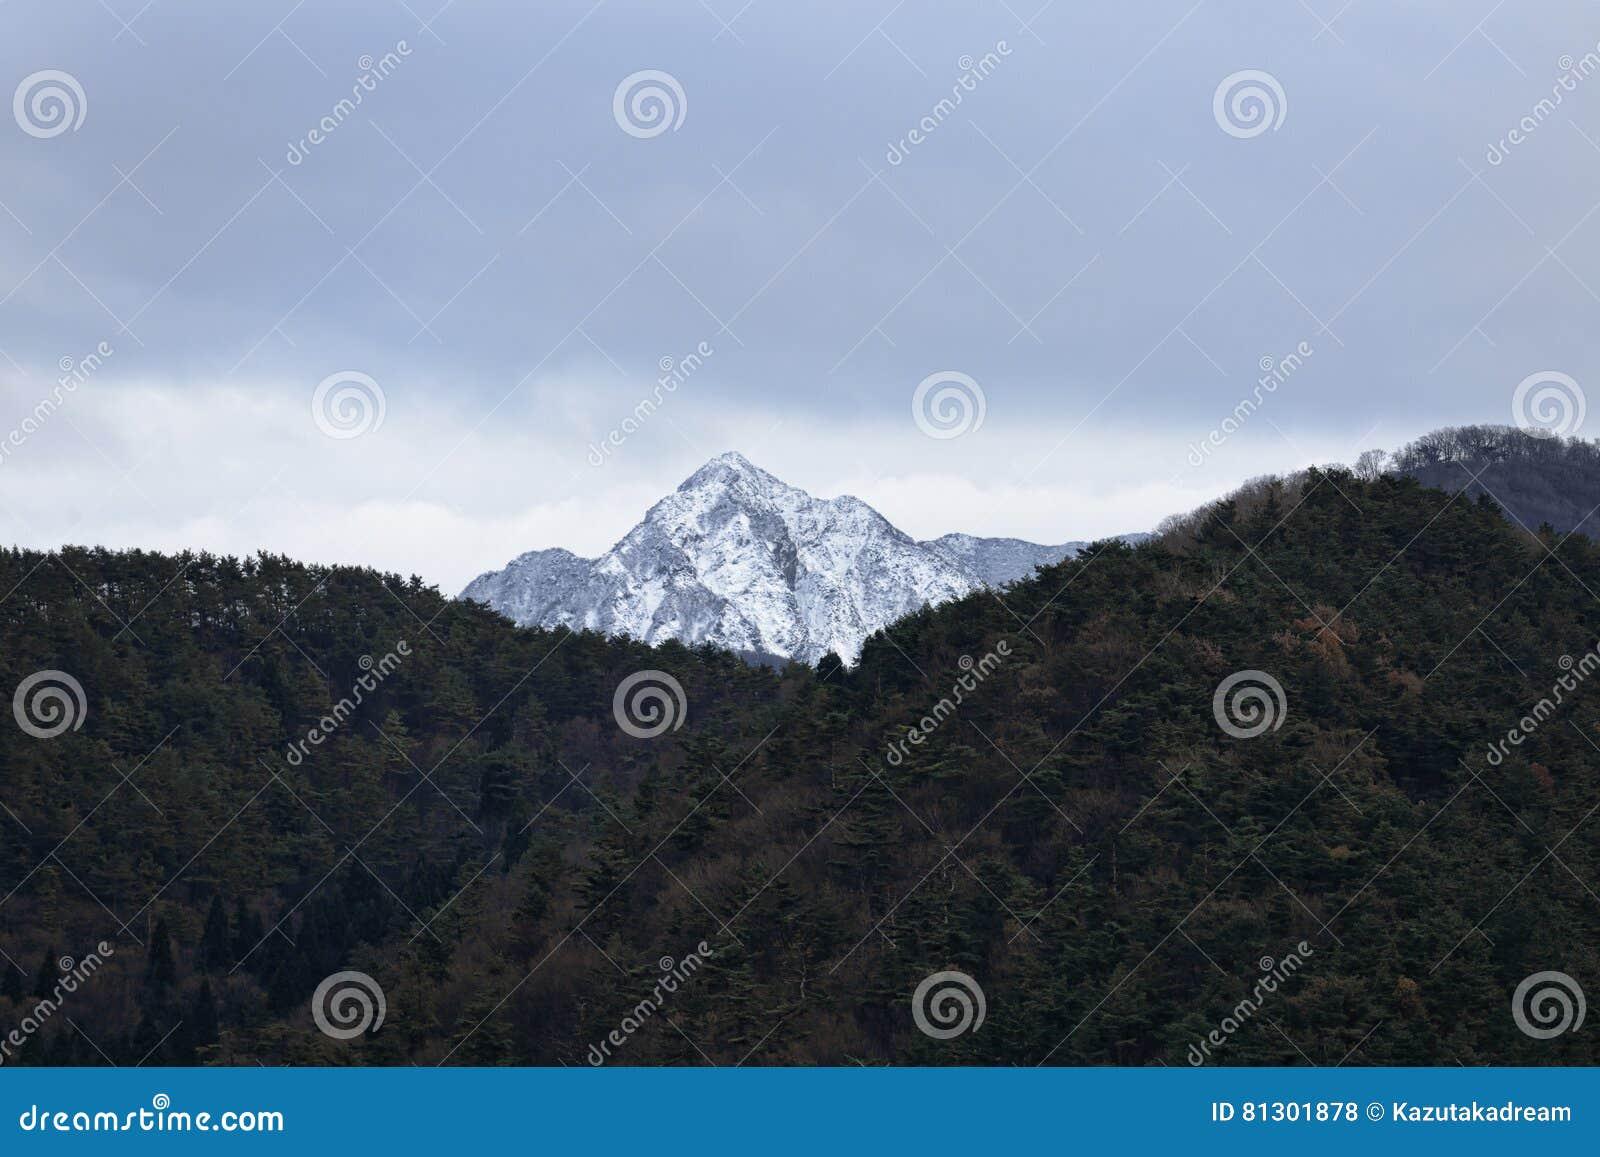 Гора с снегом